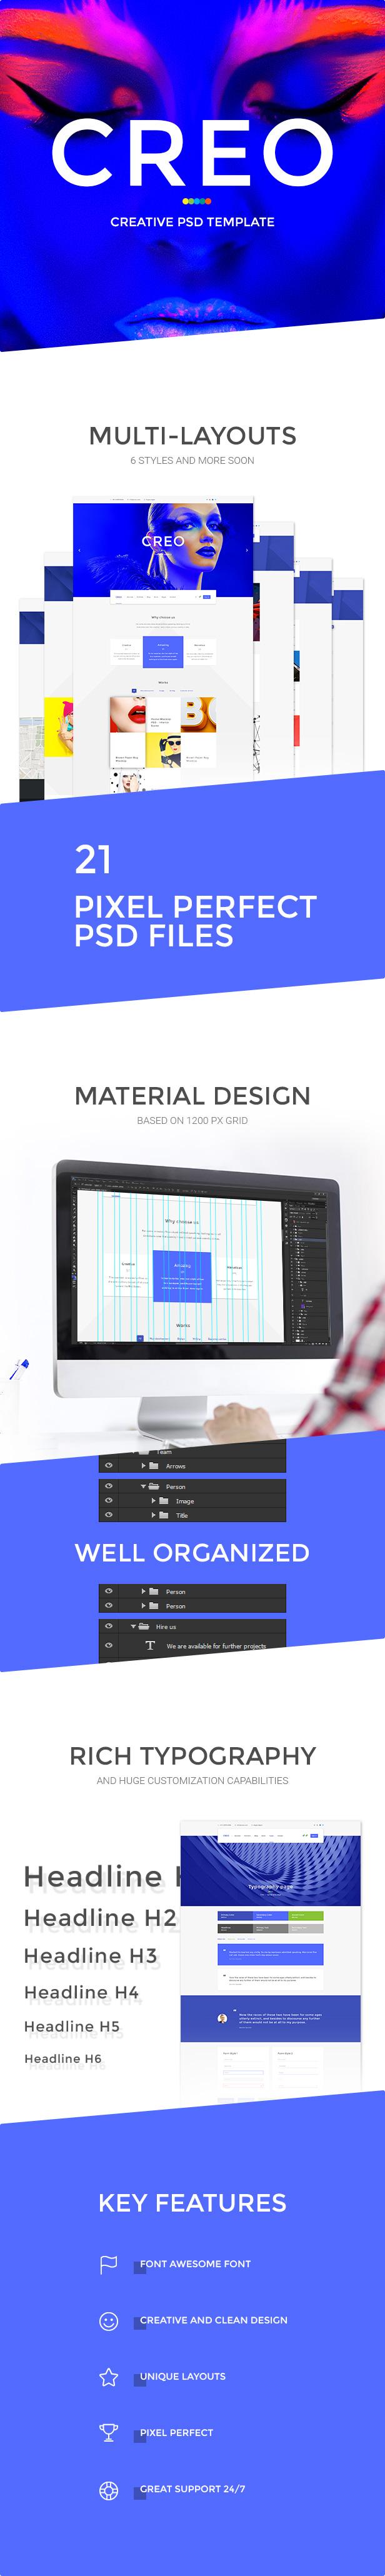 Creo — Modern Design Studio & Creative Agency PSD Template - 2